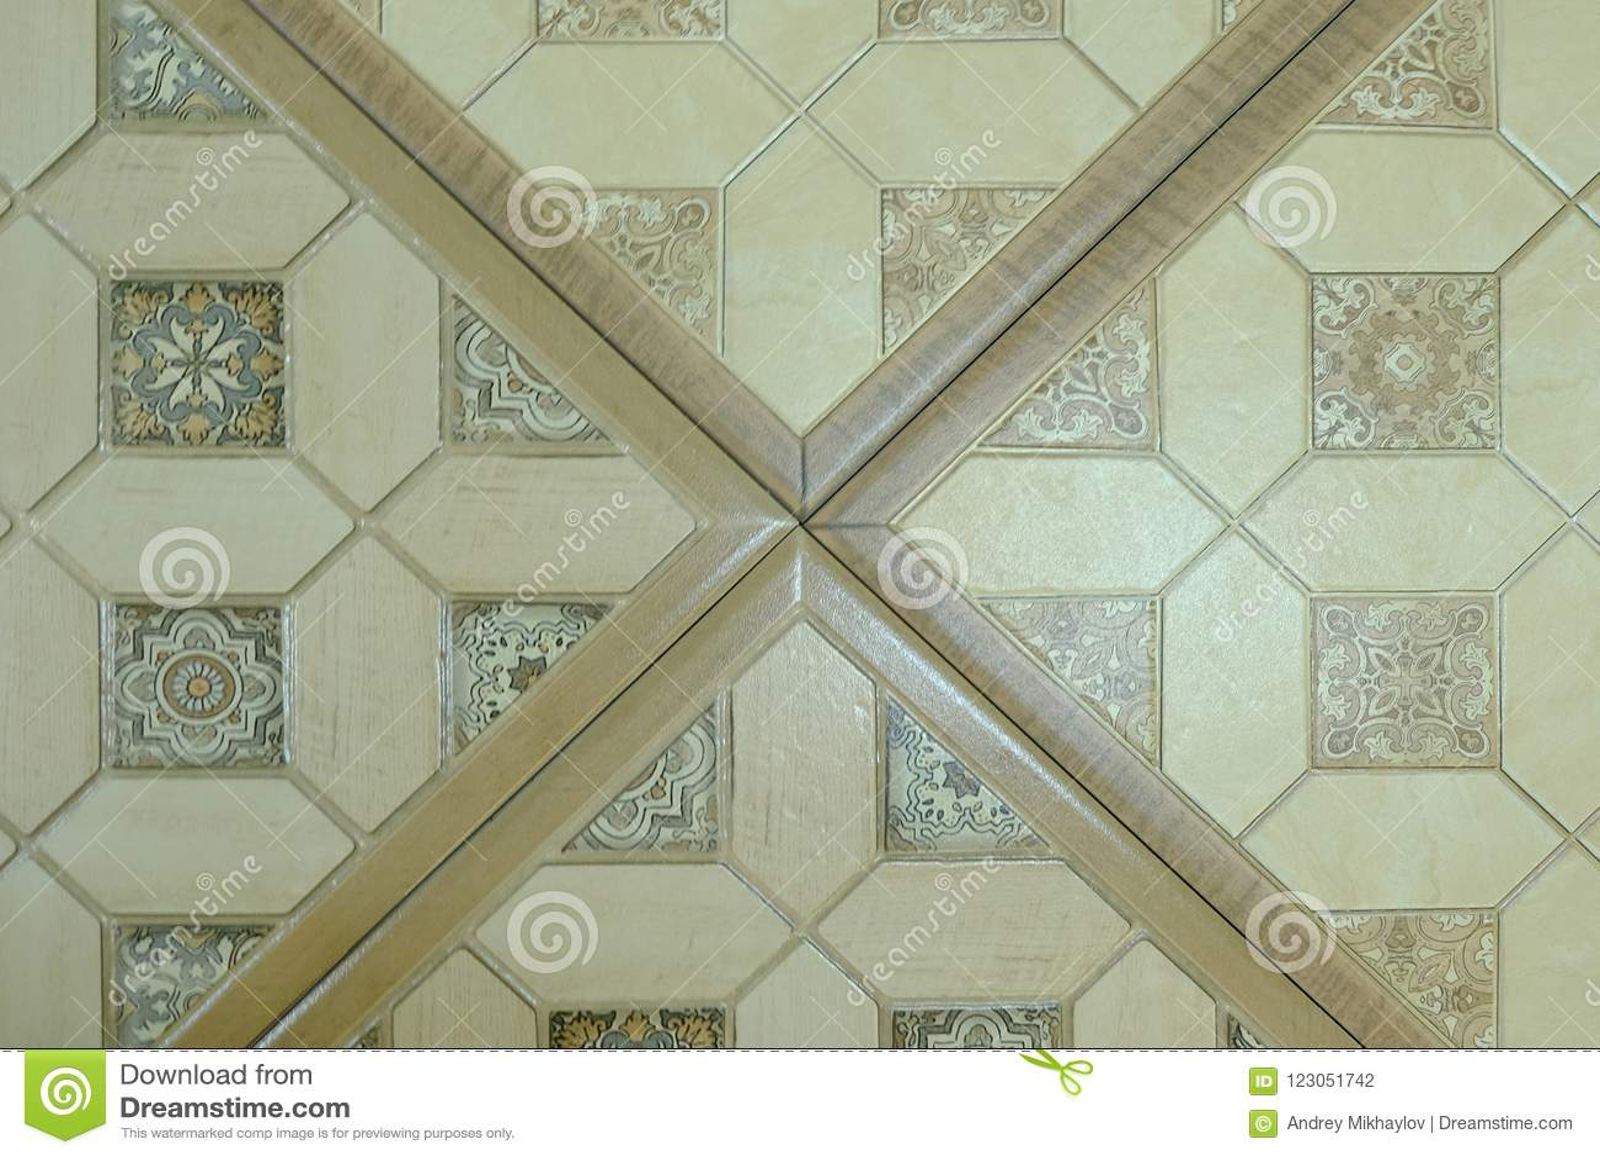 Piastrelle Cucina Con Mosaico.Piastrelle Di Ceramica Con Gli Ornamenti Mosaico Piastrelle